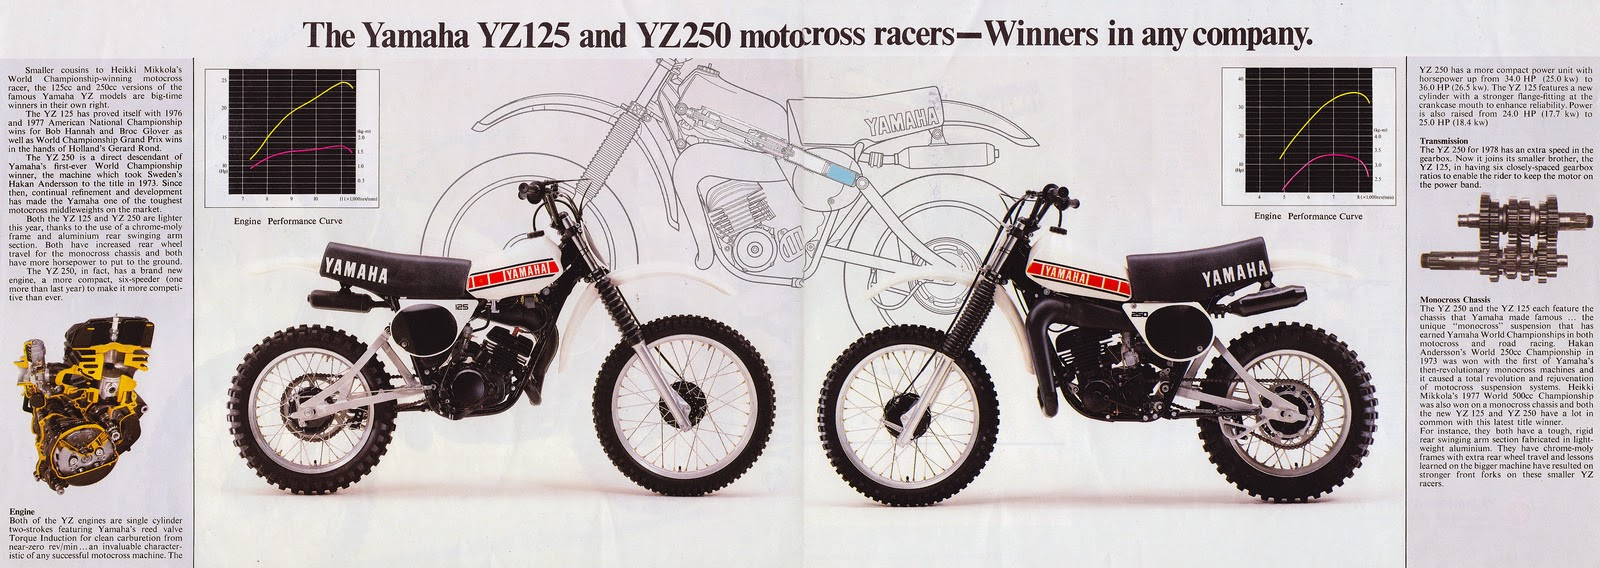 medium resolution of racing caf vintage brochures yamaha yz 125 250 1978 wiring diagram also yz 125 clutch on 89 in addition suzuki gsx r 750